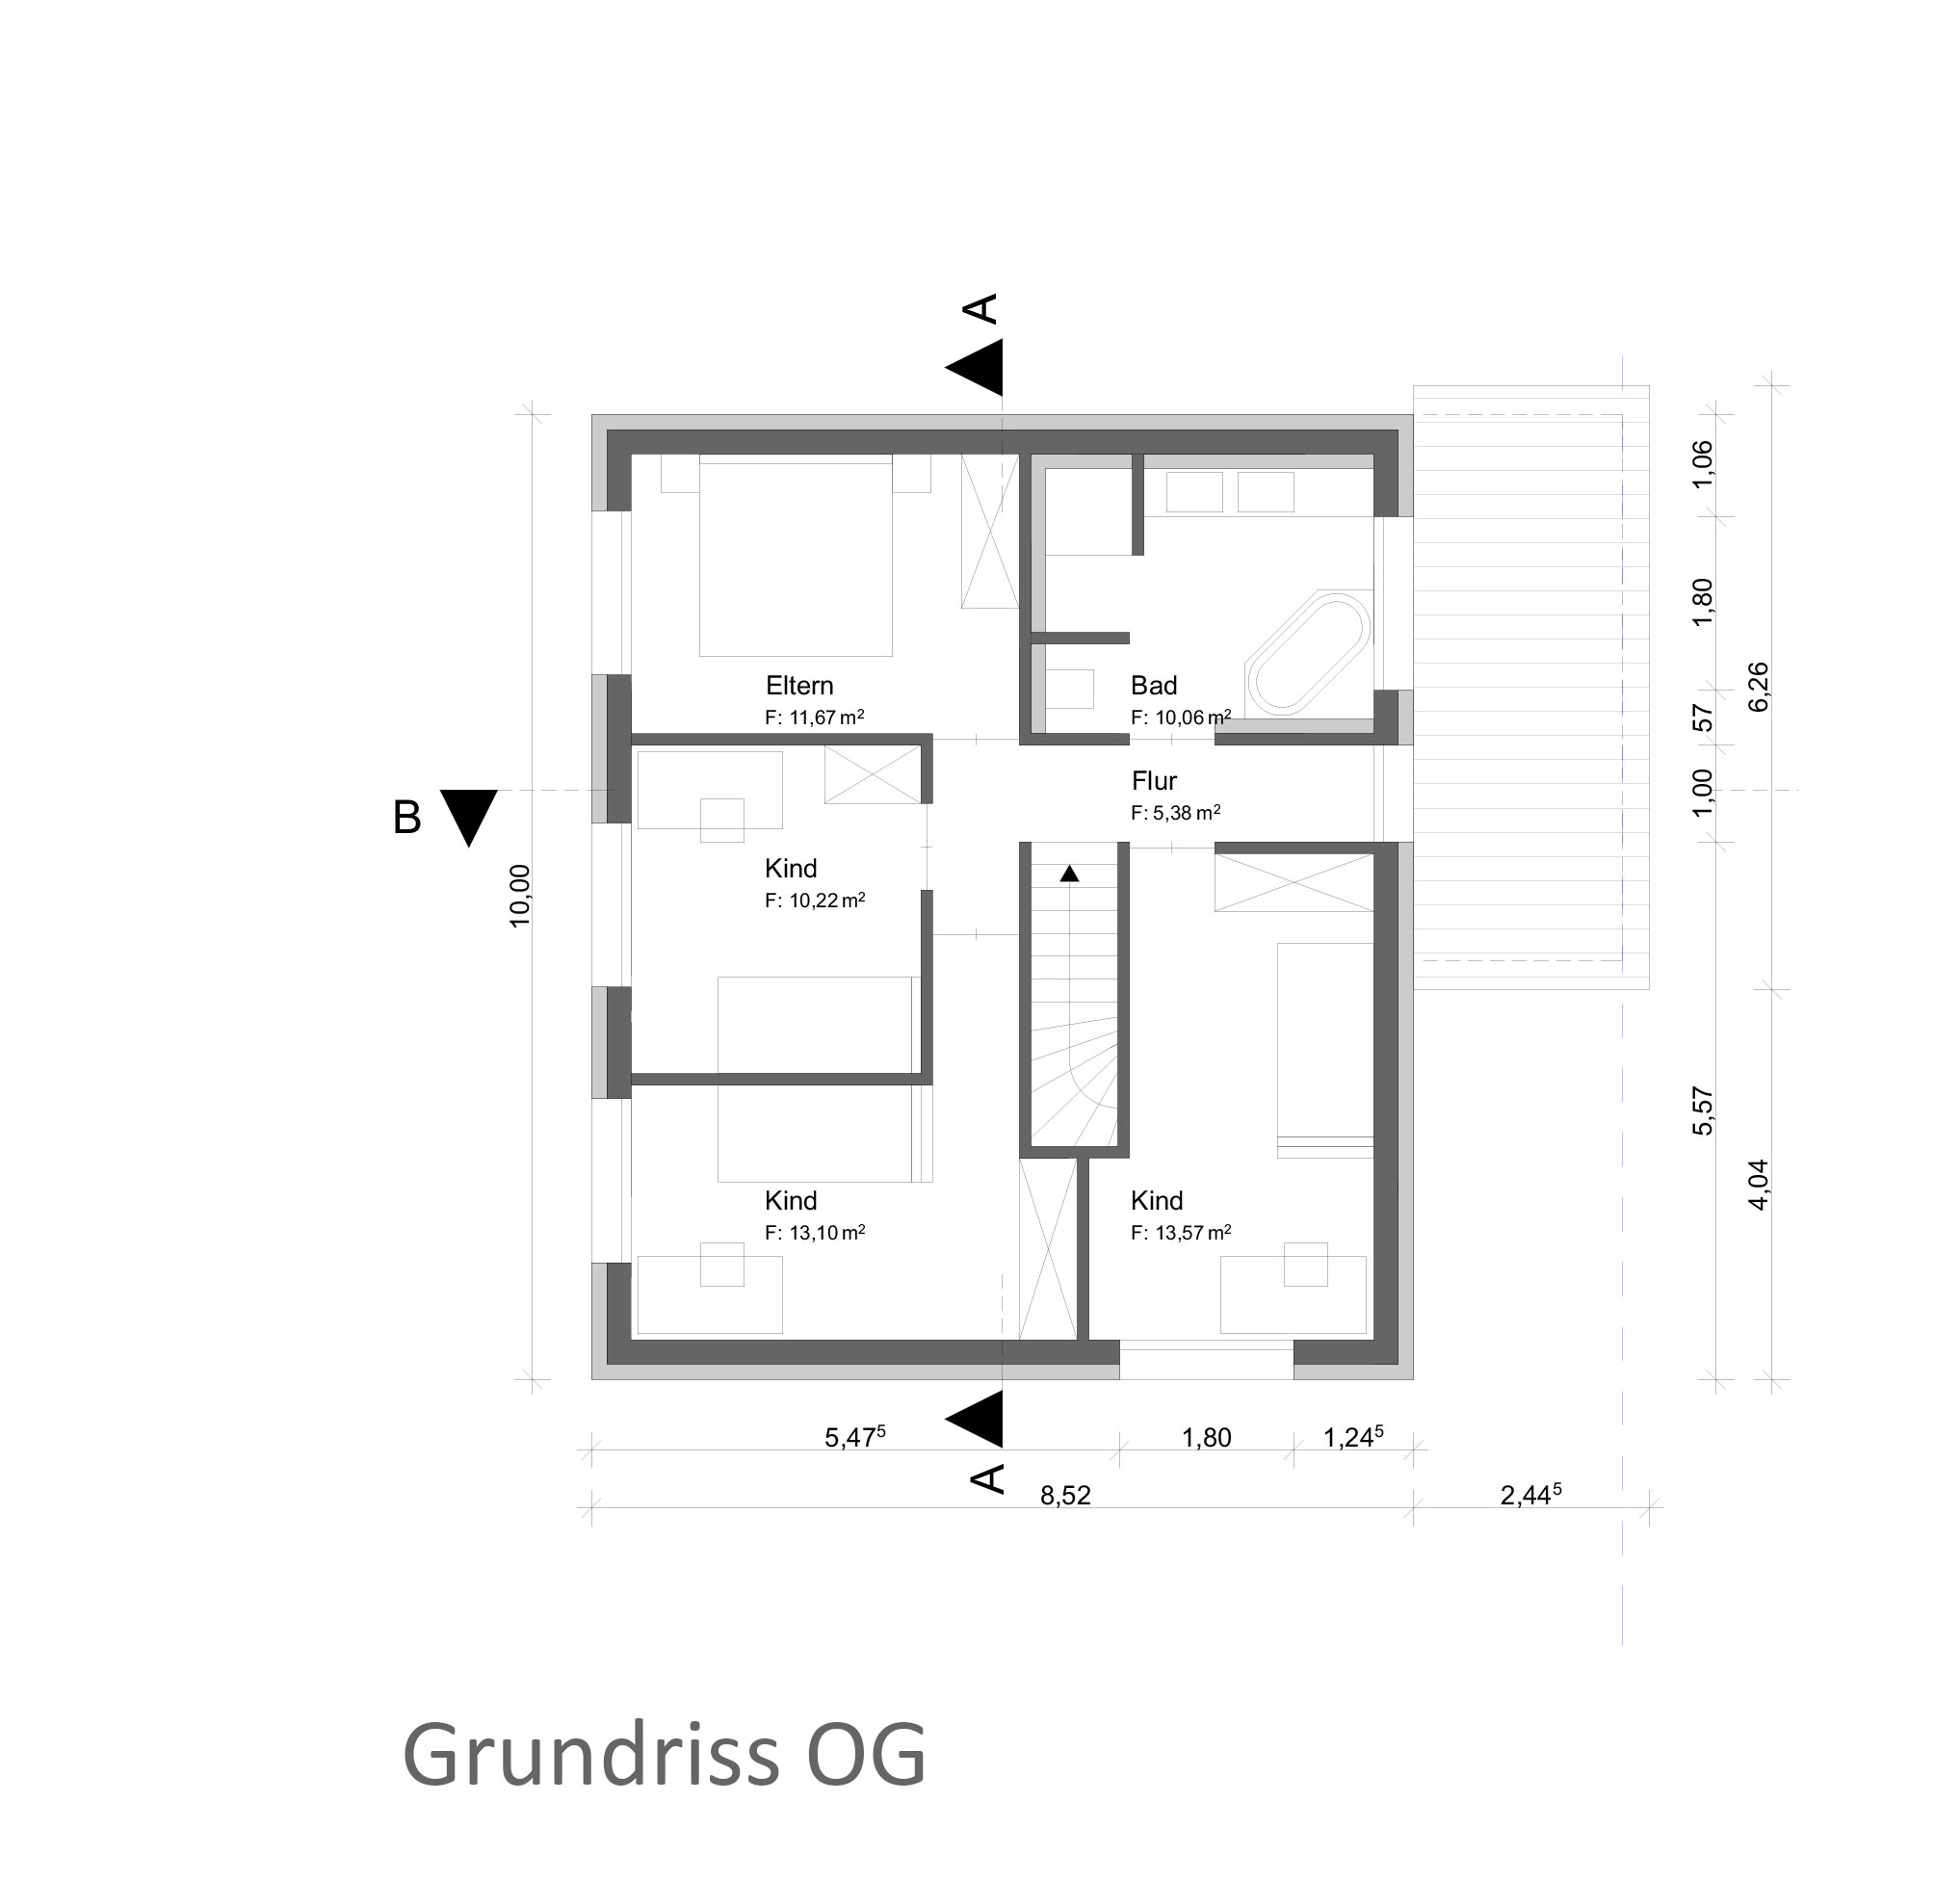 8Einfamilienhäuser Bauträger Grundriss OG Stutensee Bahnhof